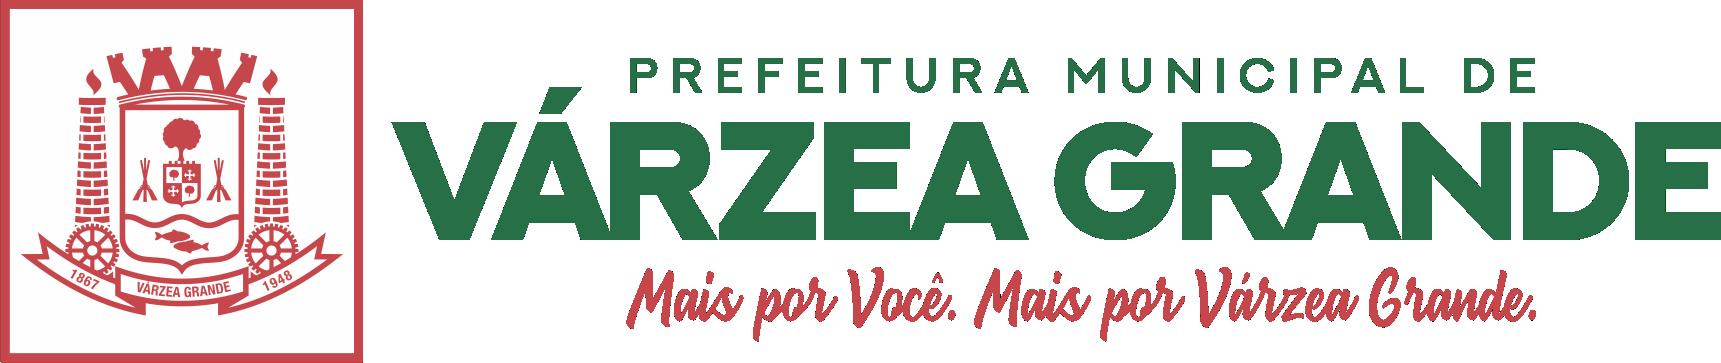 Prefeitura Municipal de Várzea Grande